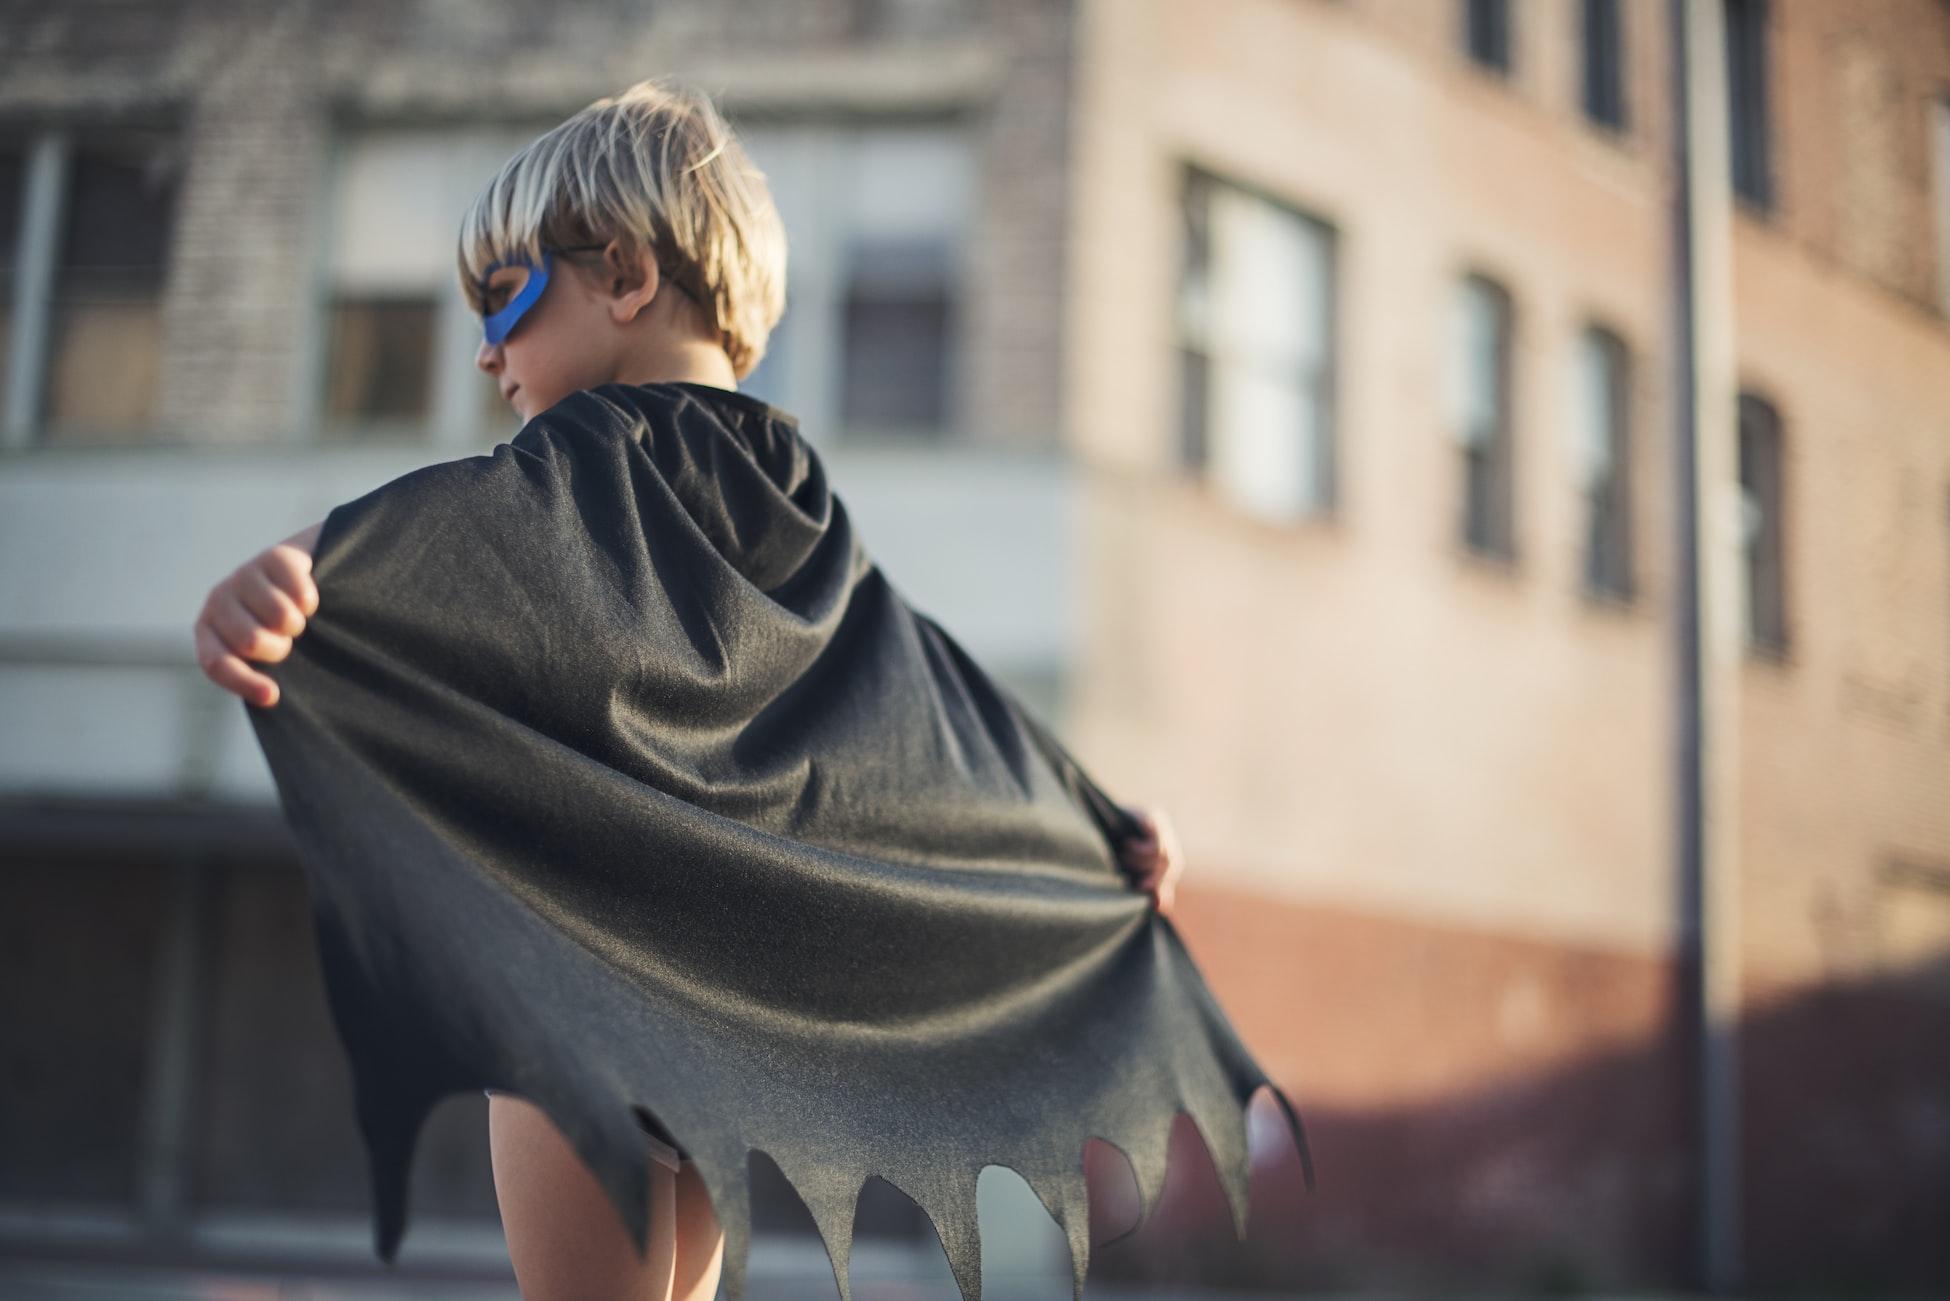 Grandiose behavior in children with bipolar disorder